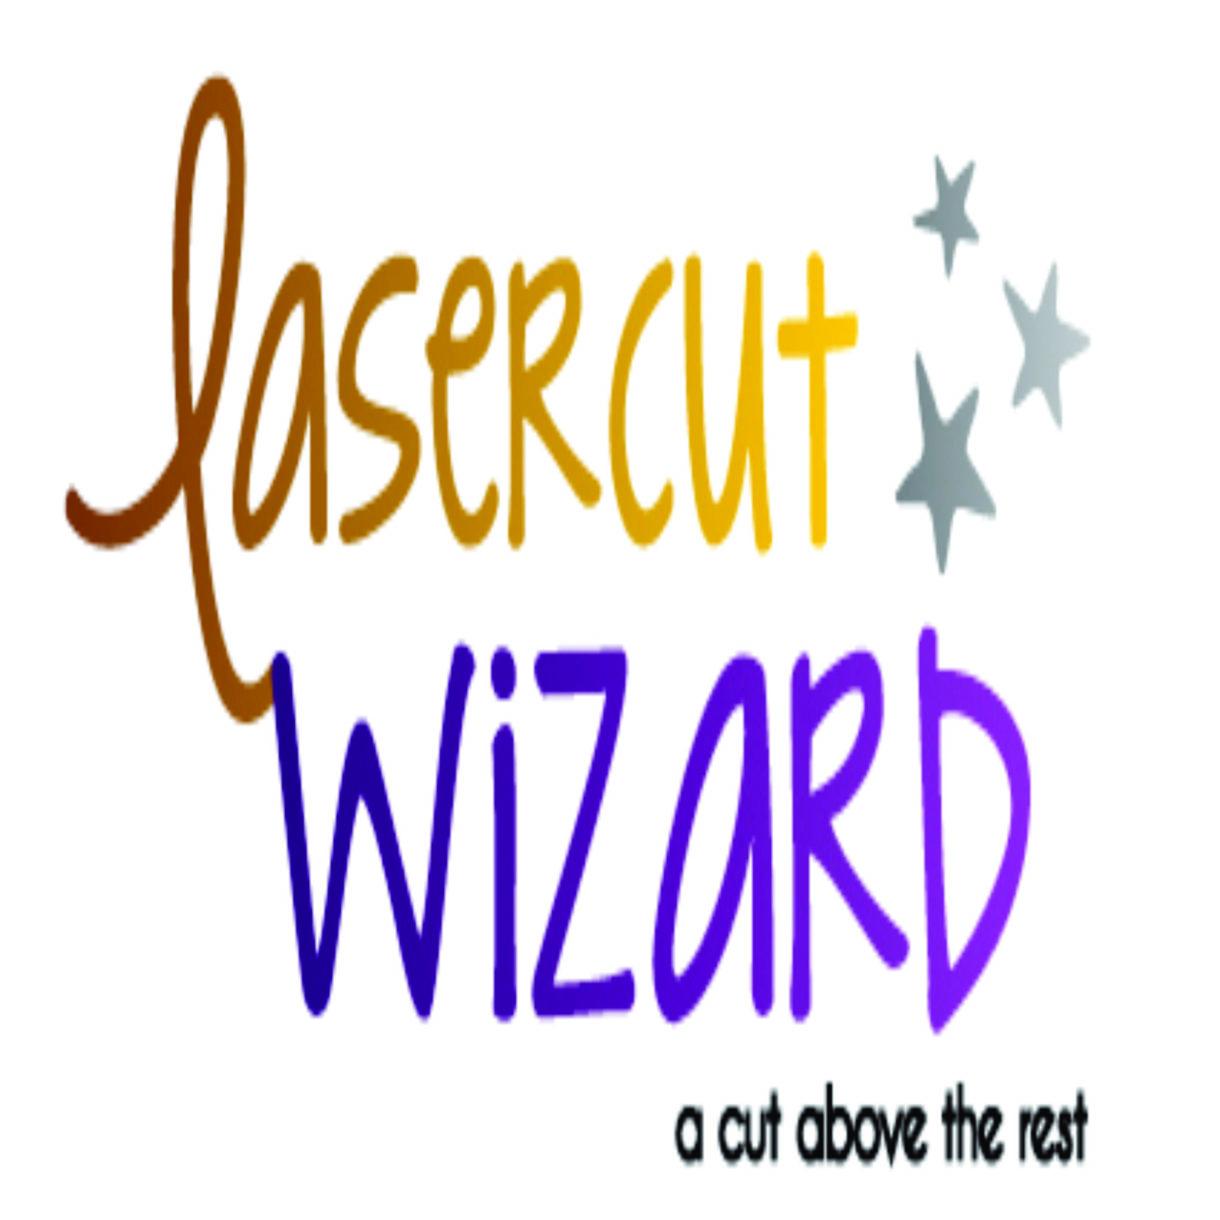 Laser Cut Wizard